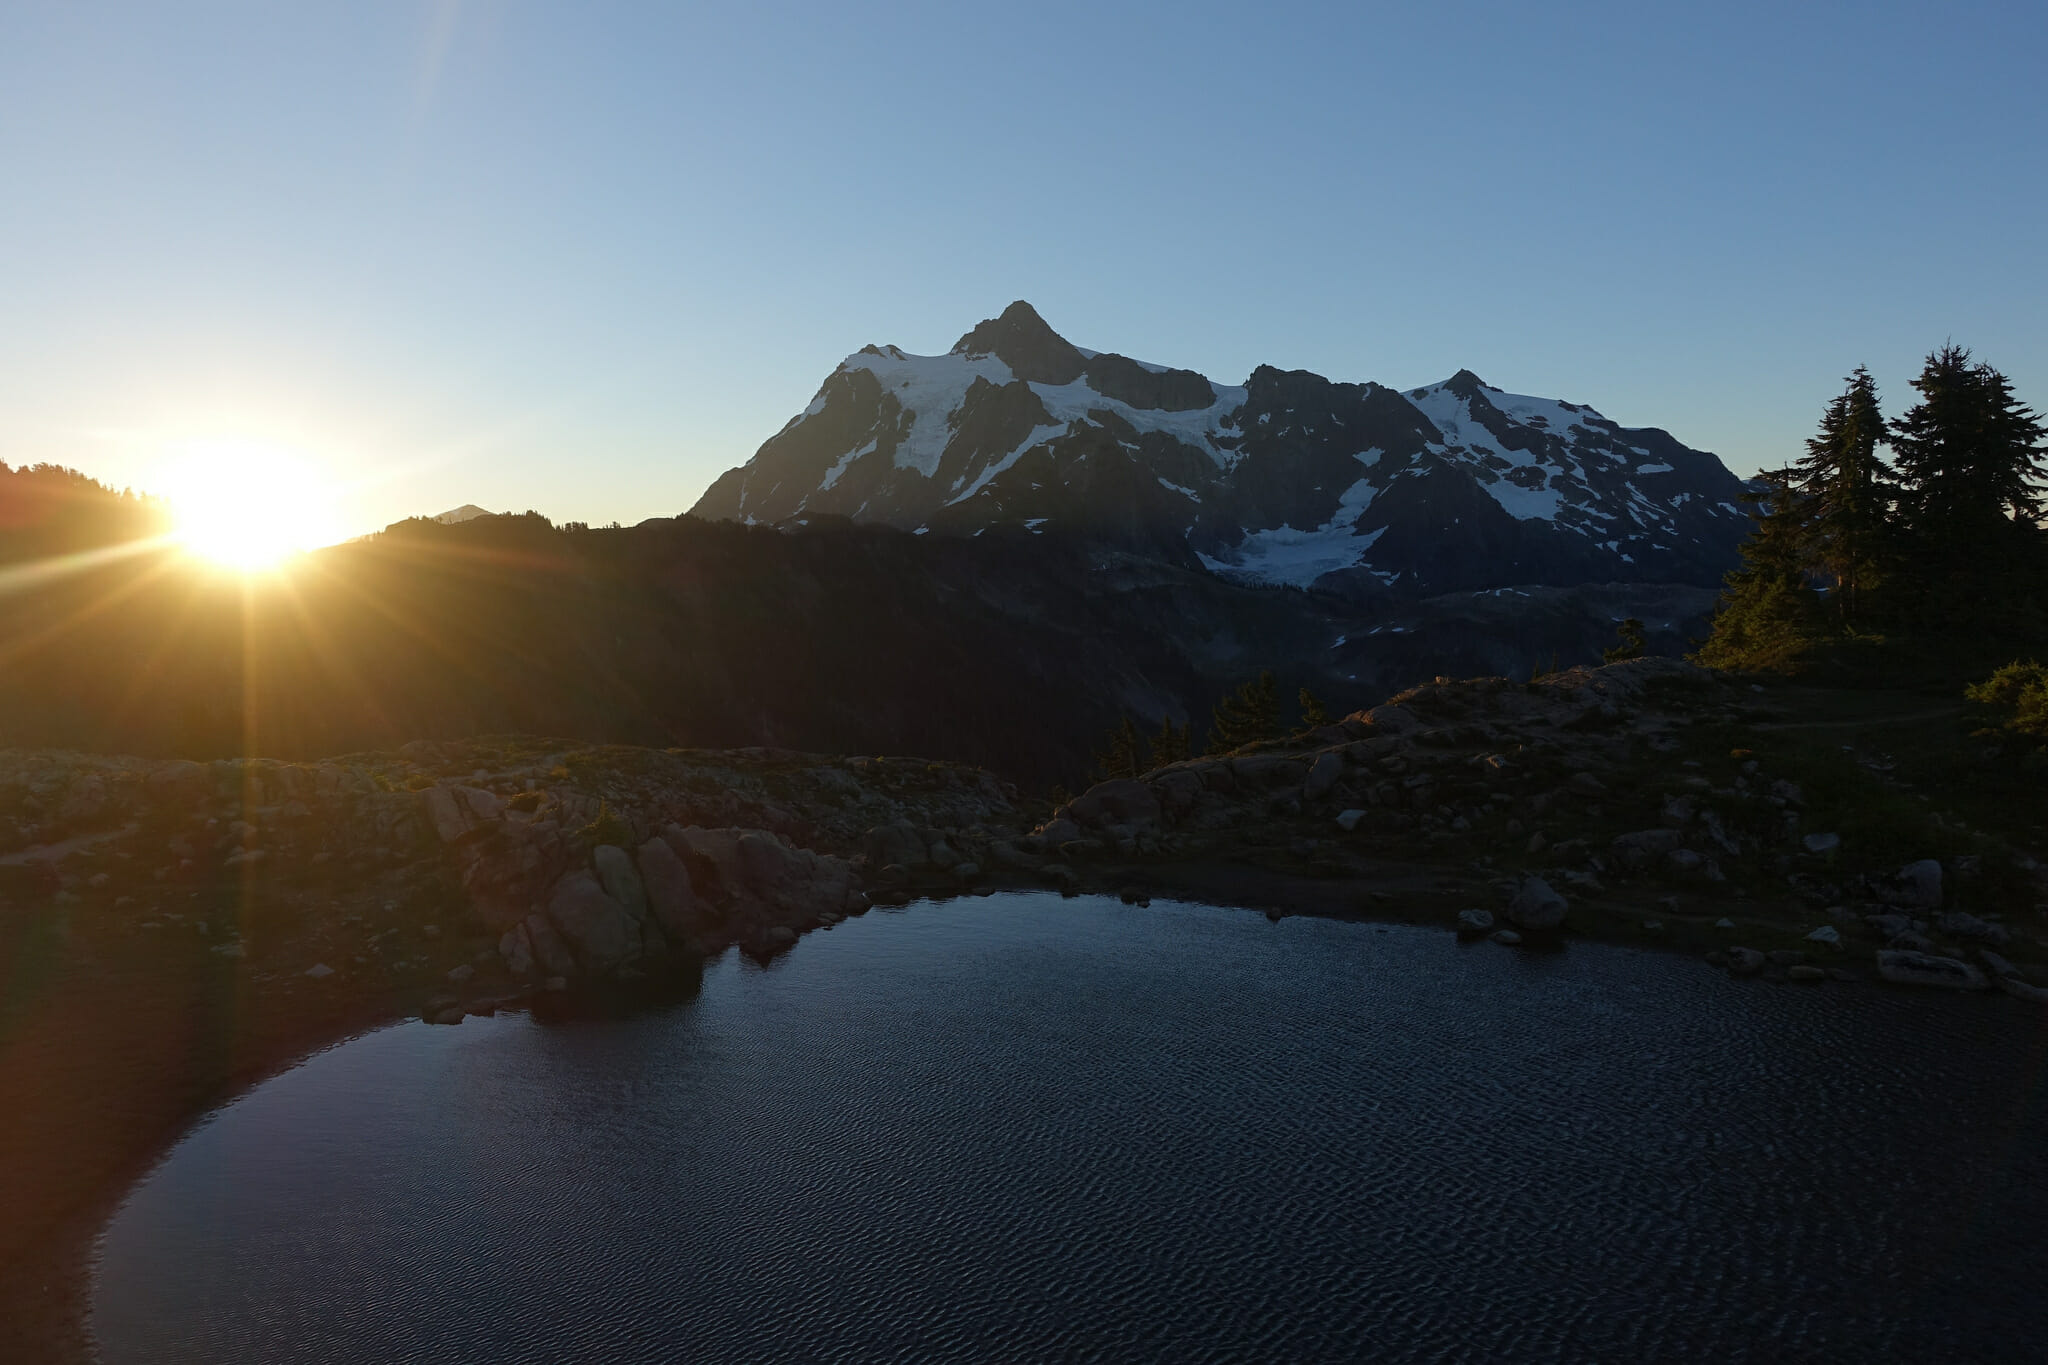 The sun rises over Mount Shuksan and a tarn